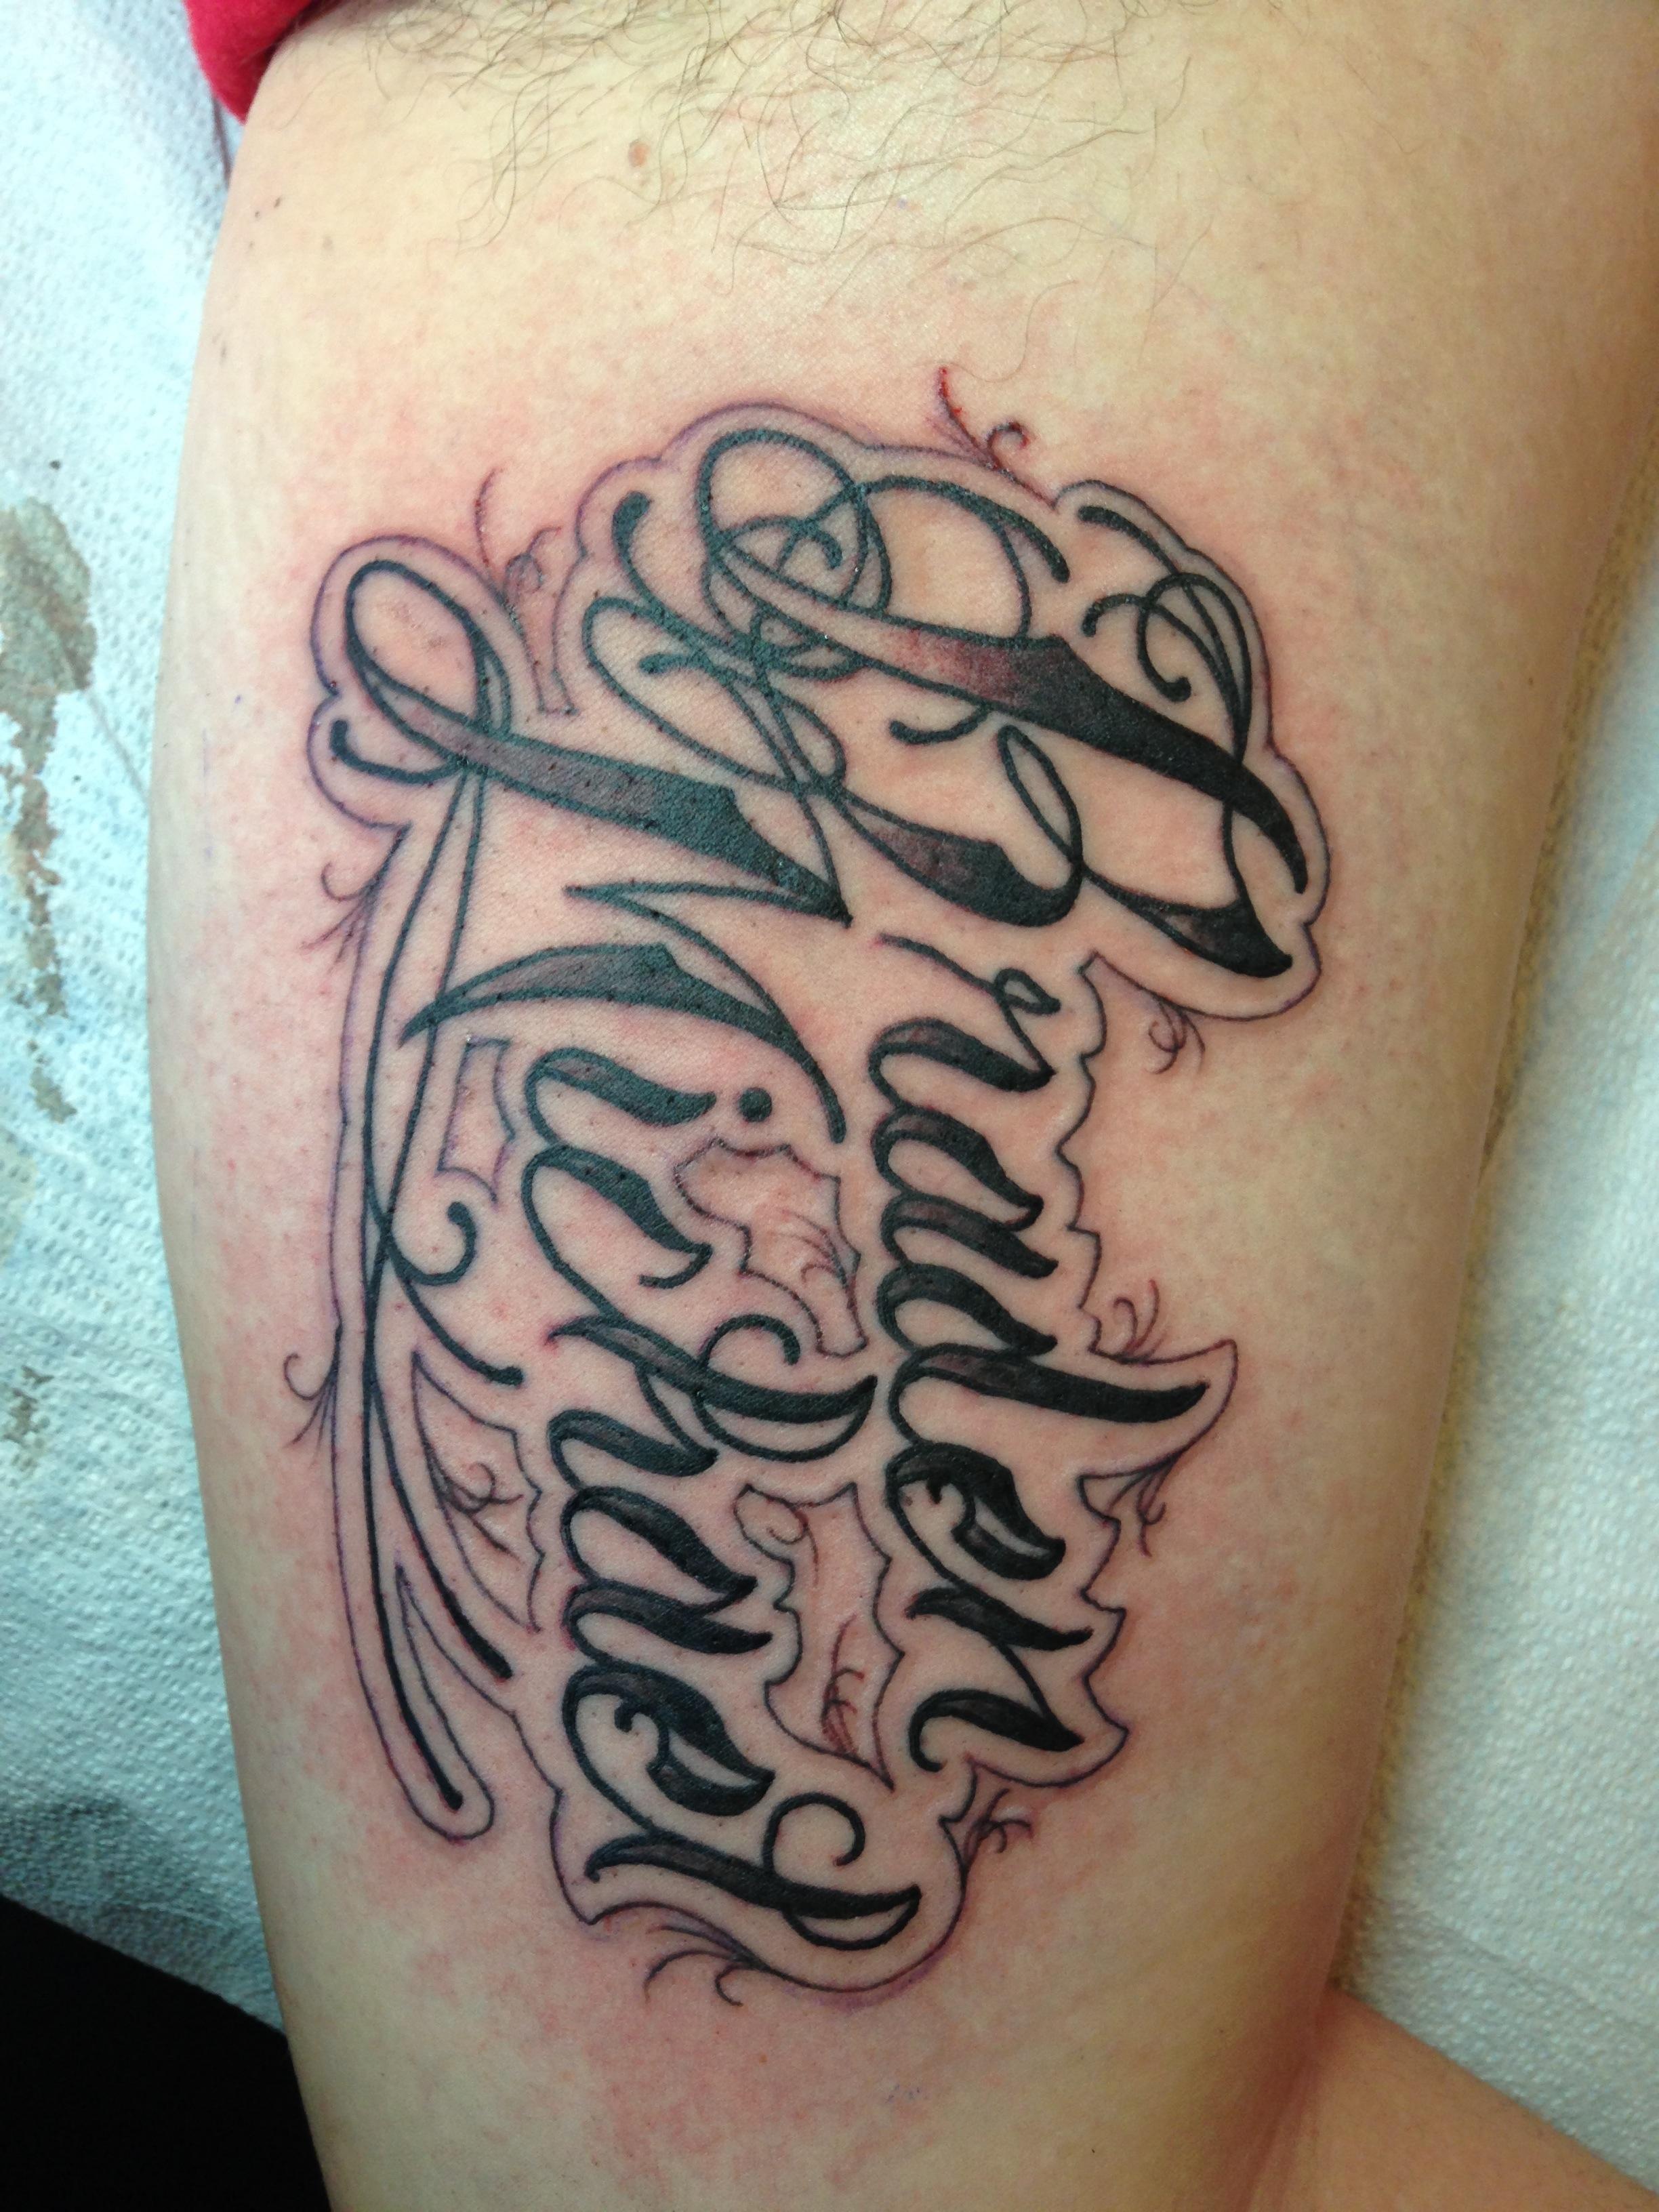 Godspeed chagotattoos for Fancy name tattoos